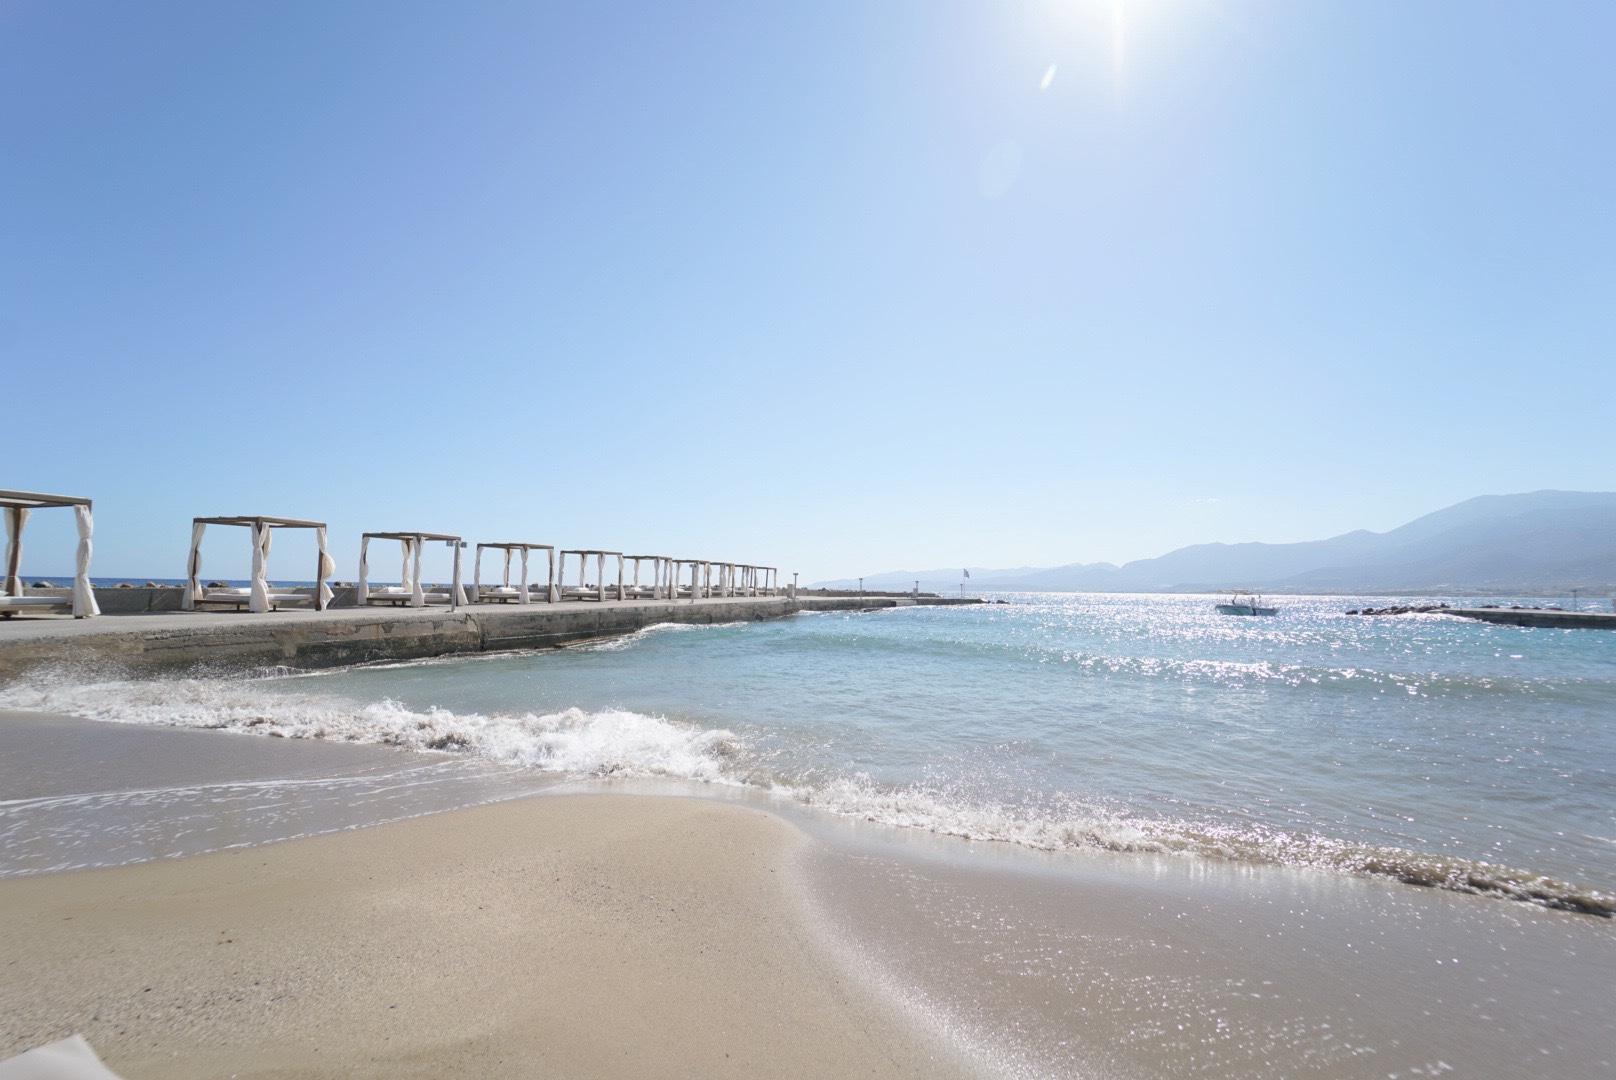 acs 0177 - Babymoon in Greece